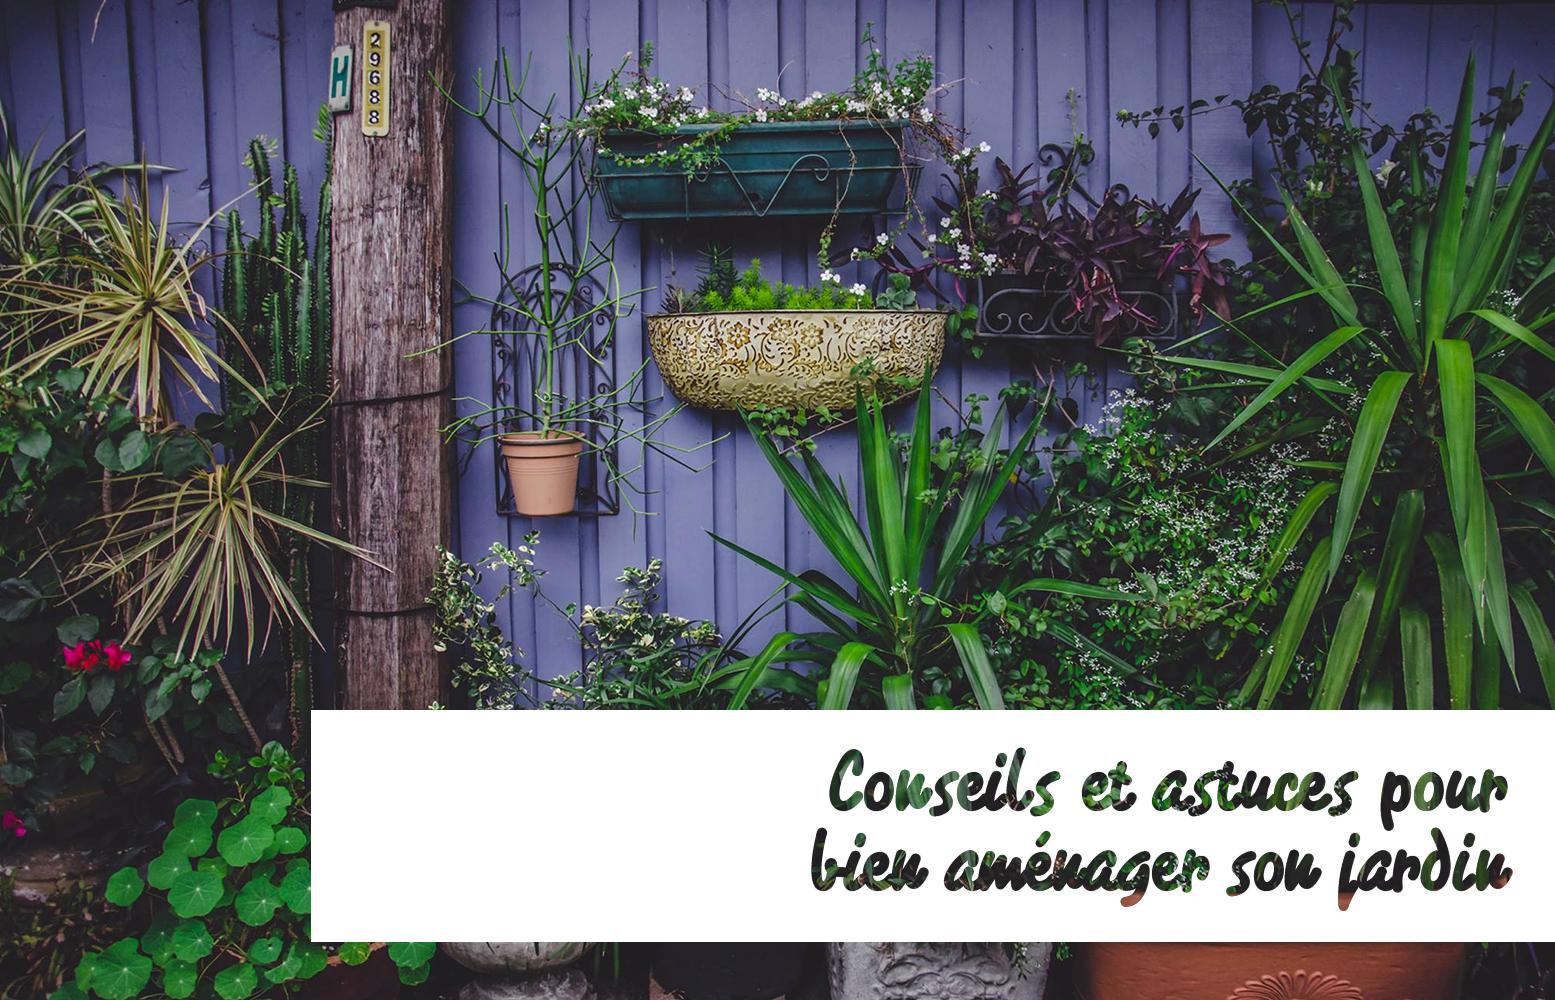 Amenager Son Jardin A Moindre Cout | Comment Aménager Son Jardin ...